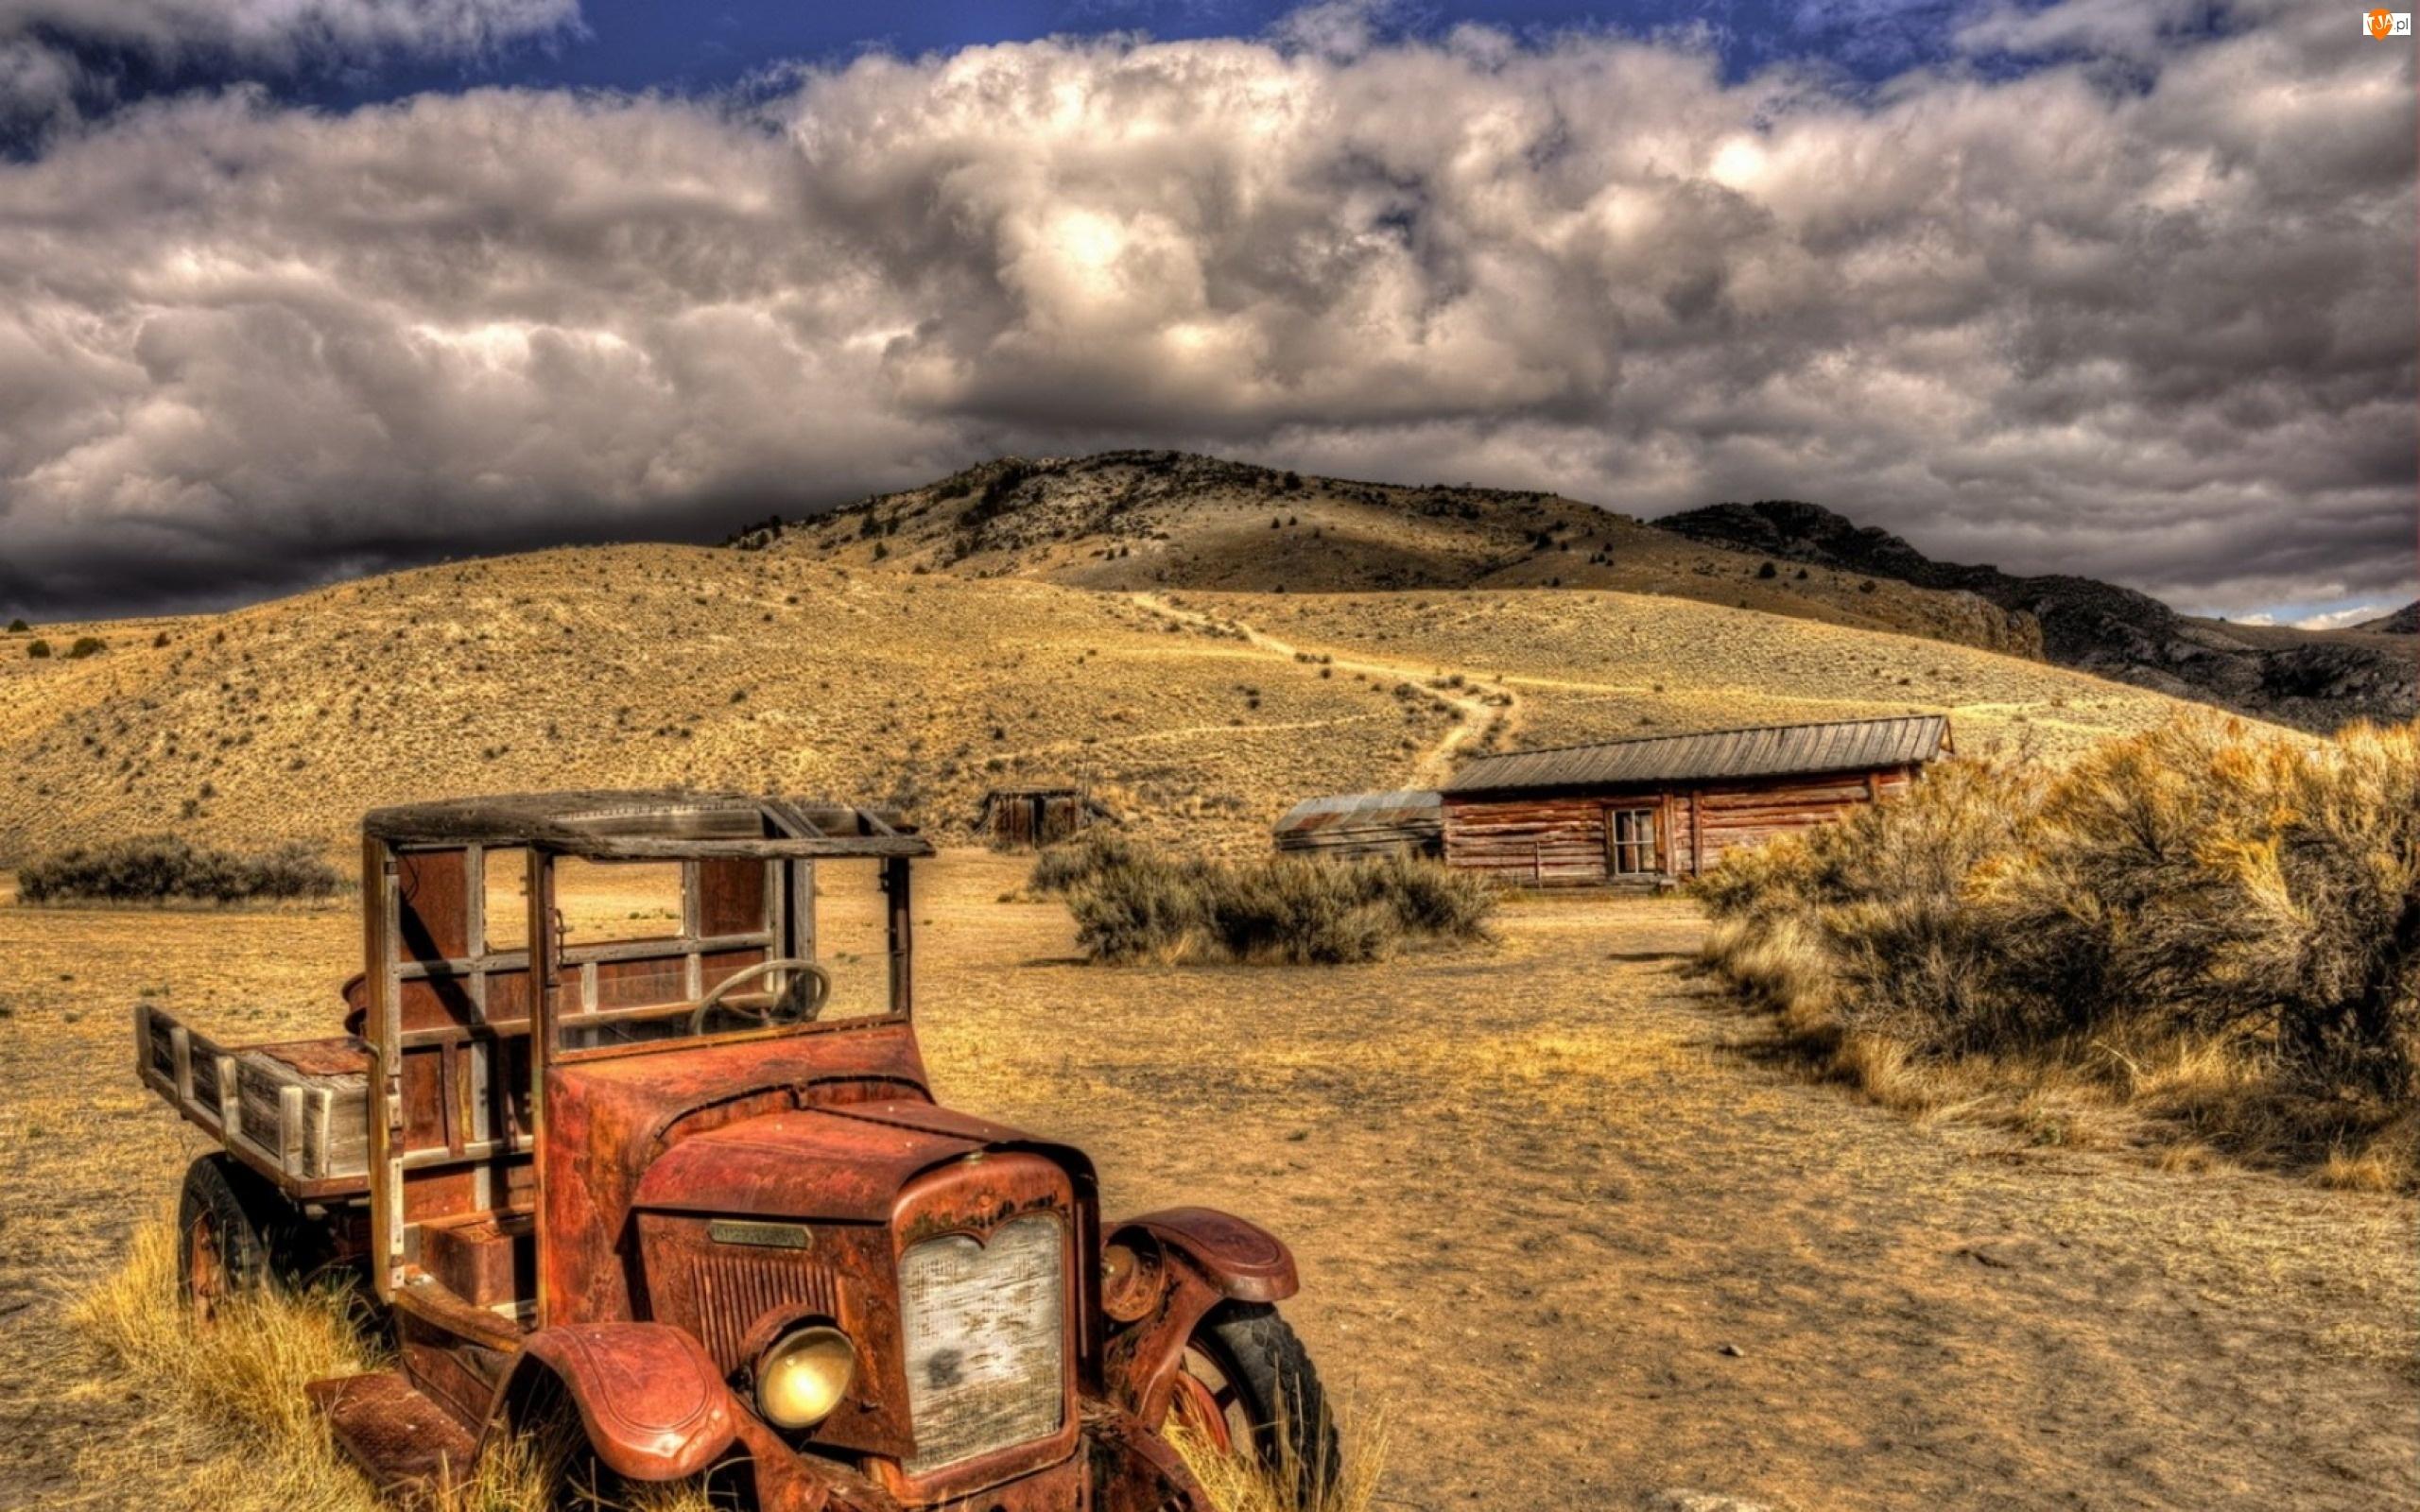 Pole, Stara, Ciężarówka